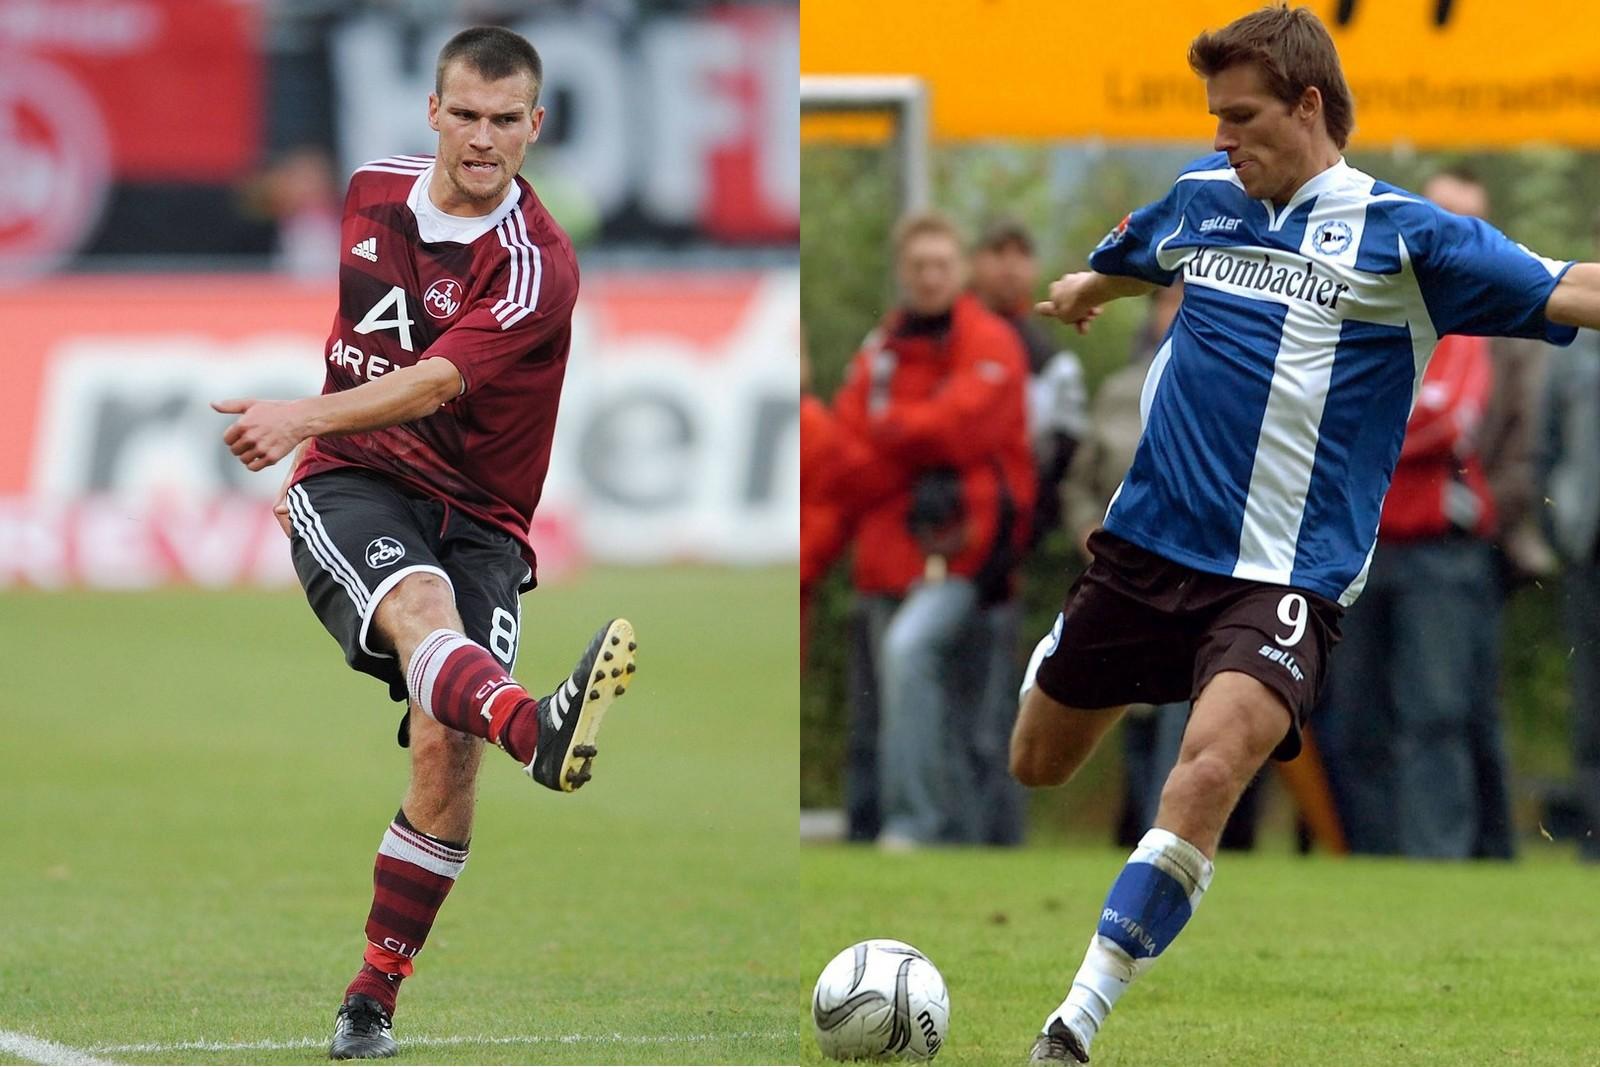 Christian Eigler im Trikot des 1. FC Nürnberg und Arminia Bielefeld